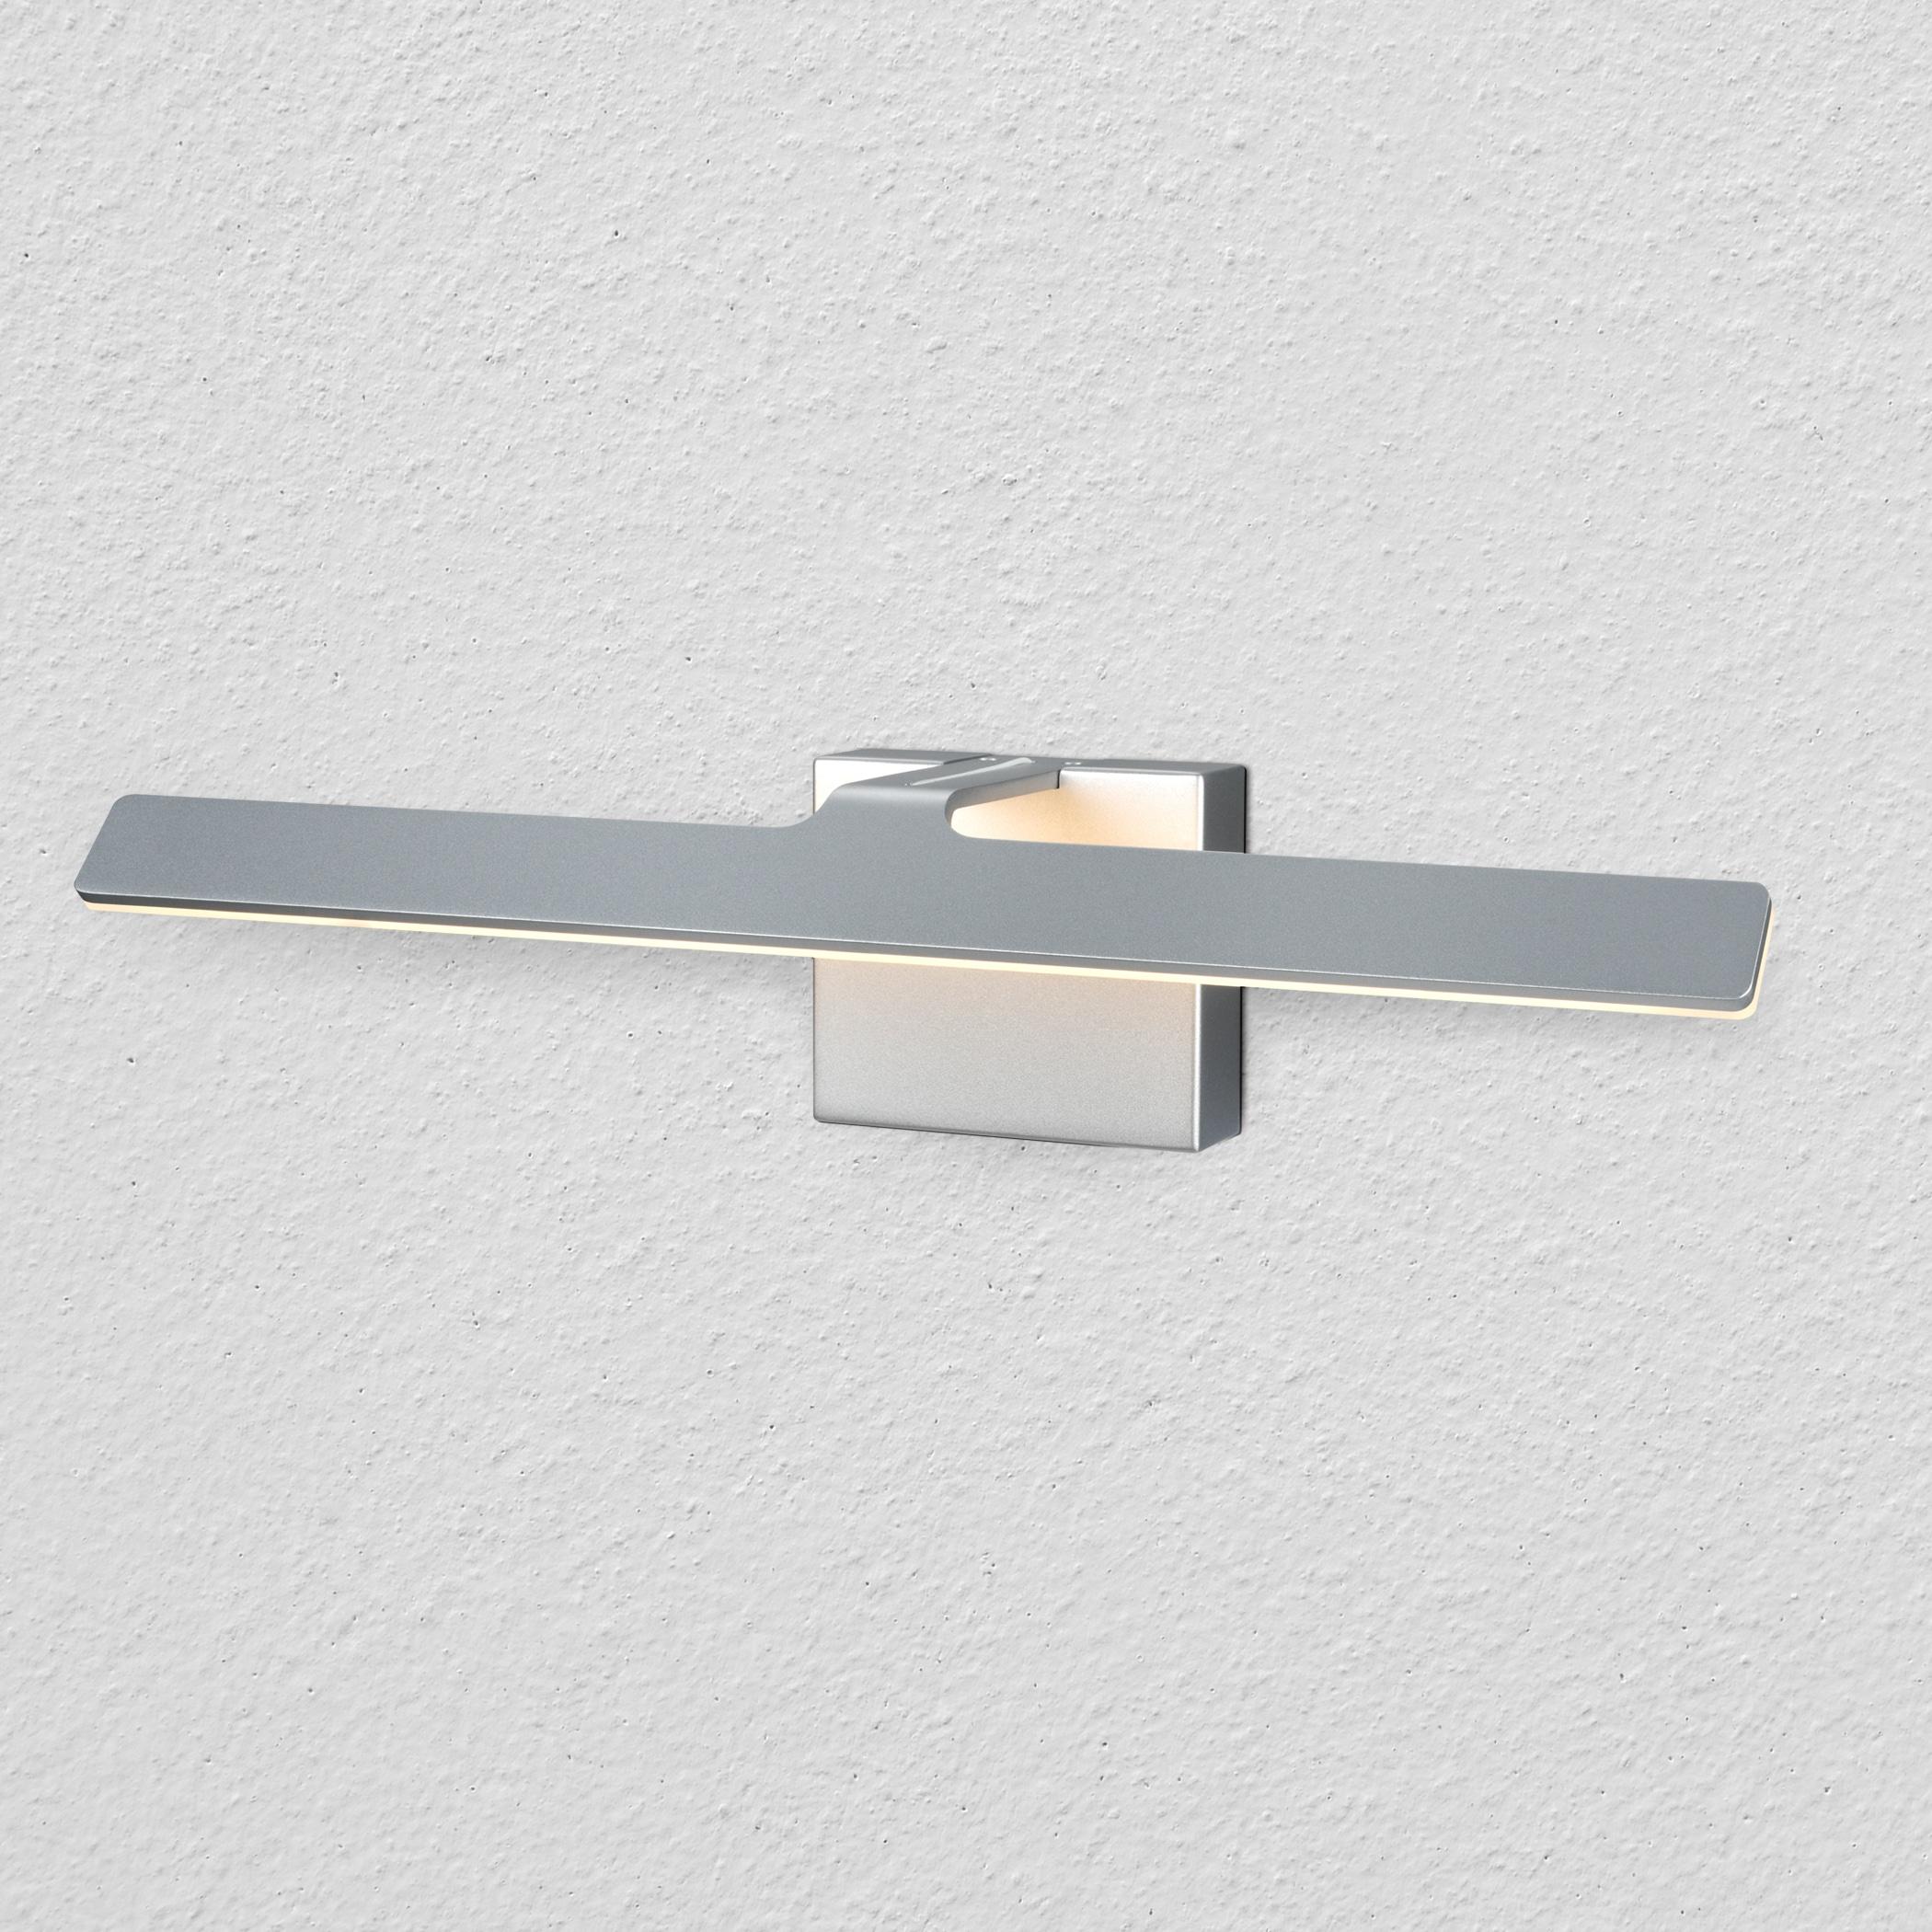 Wezen Vmw11400al 21 Led Bathroom Light Vanity Light